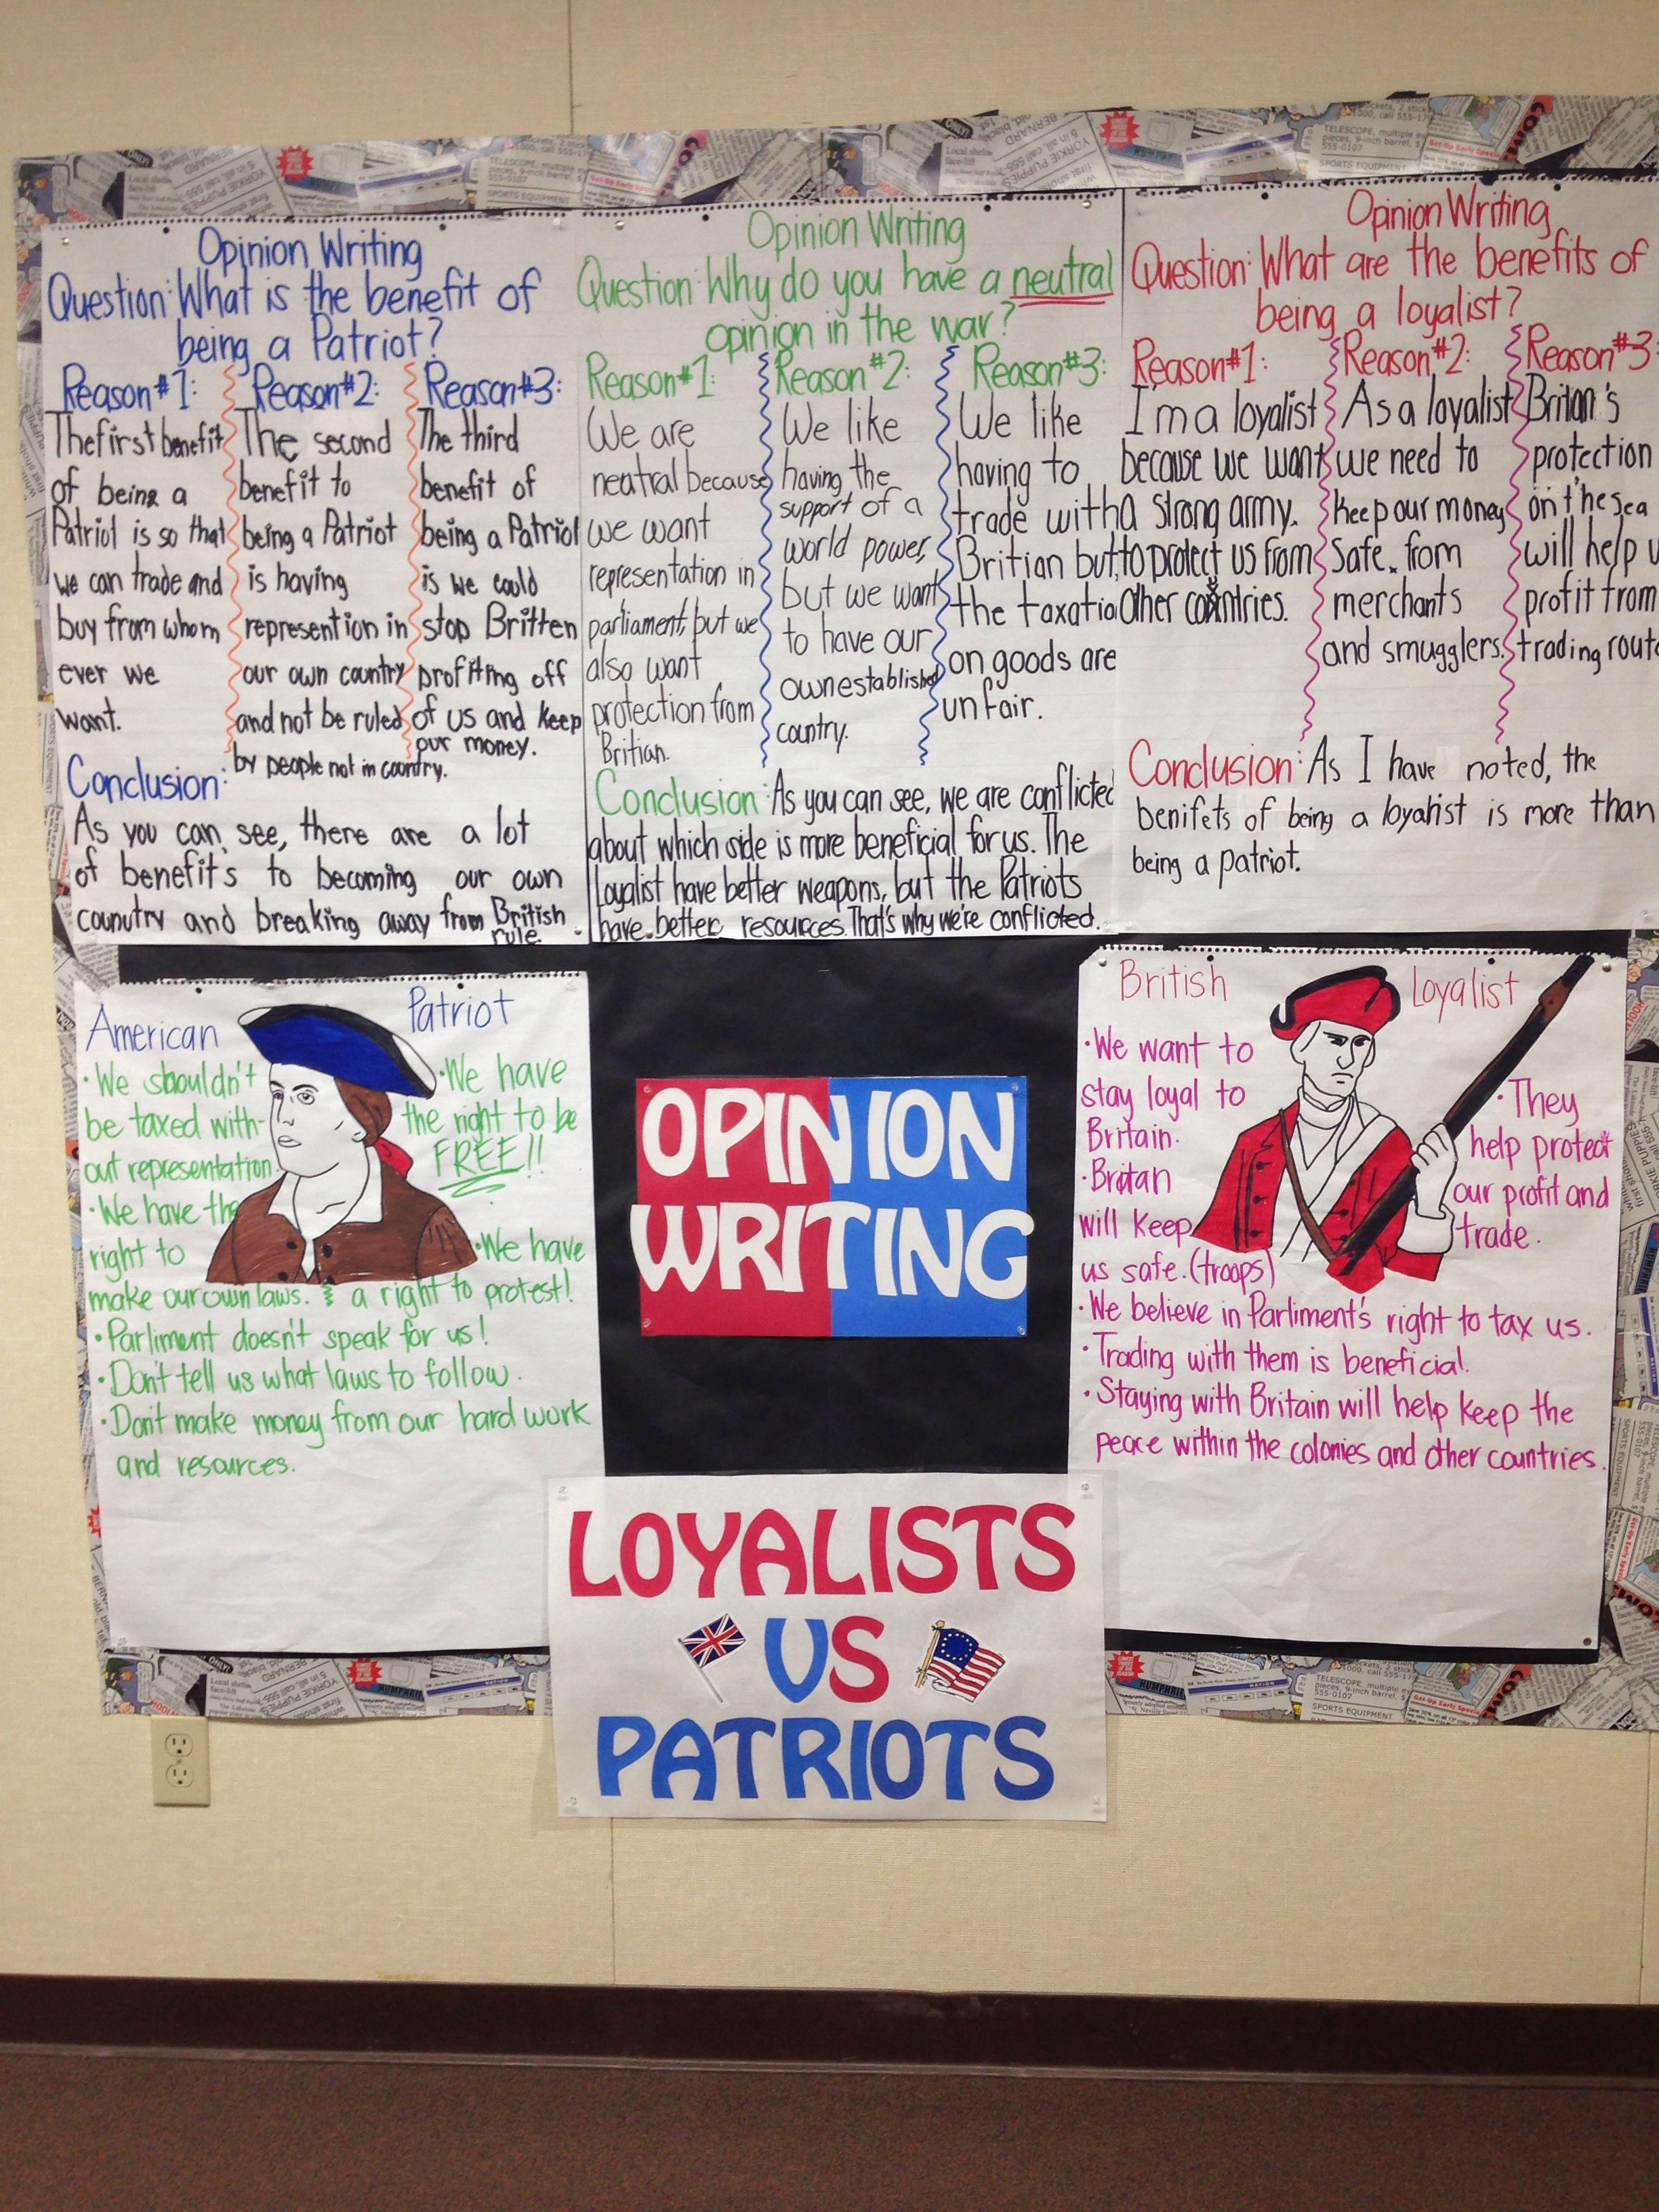 Loyalist Vs Patriots Group Opinion Writing Activity